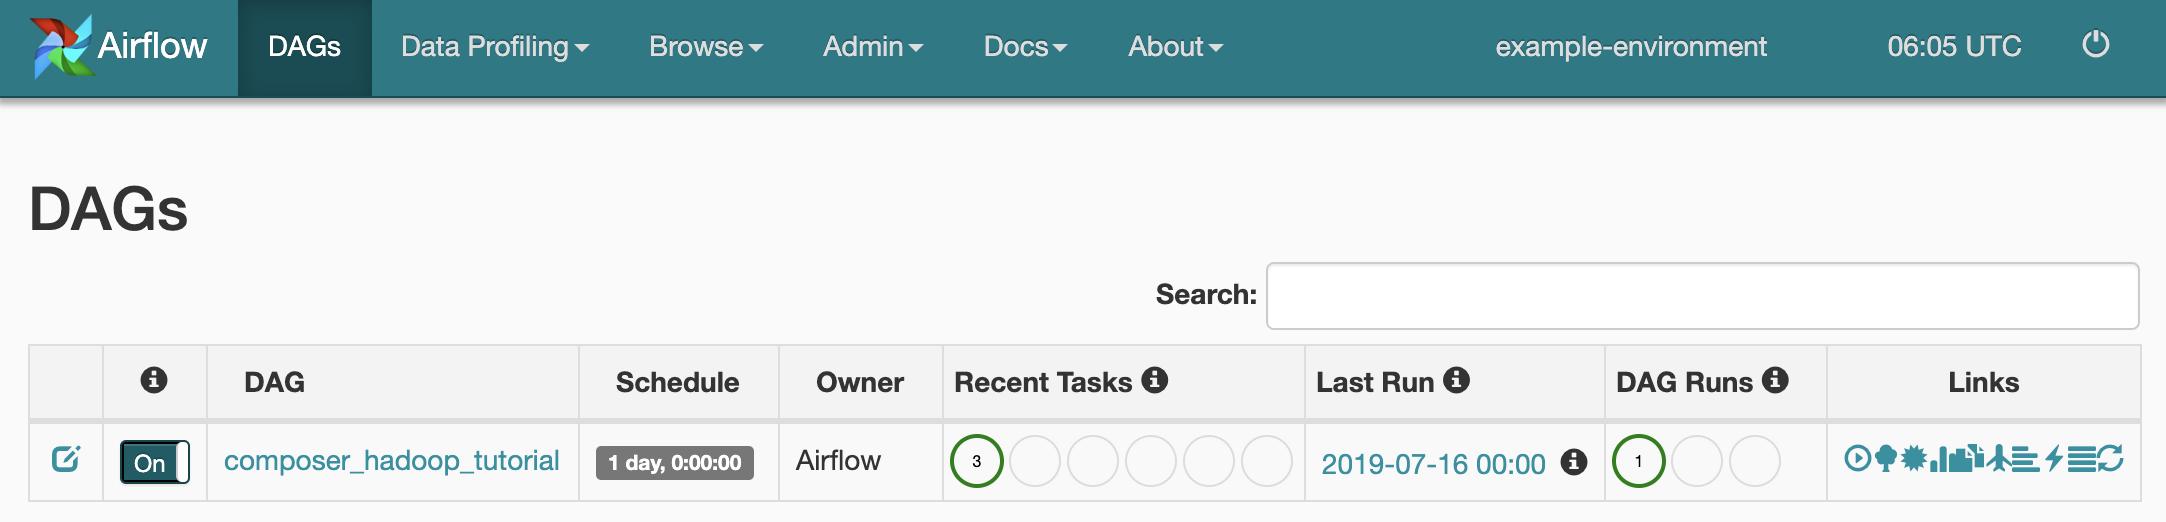 Running a Hadoop wordcount job on a Cloud Dataproc cluster